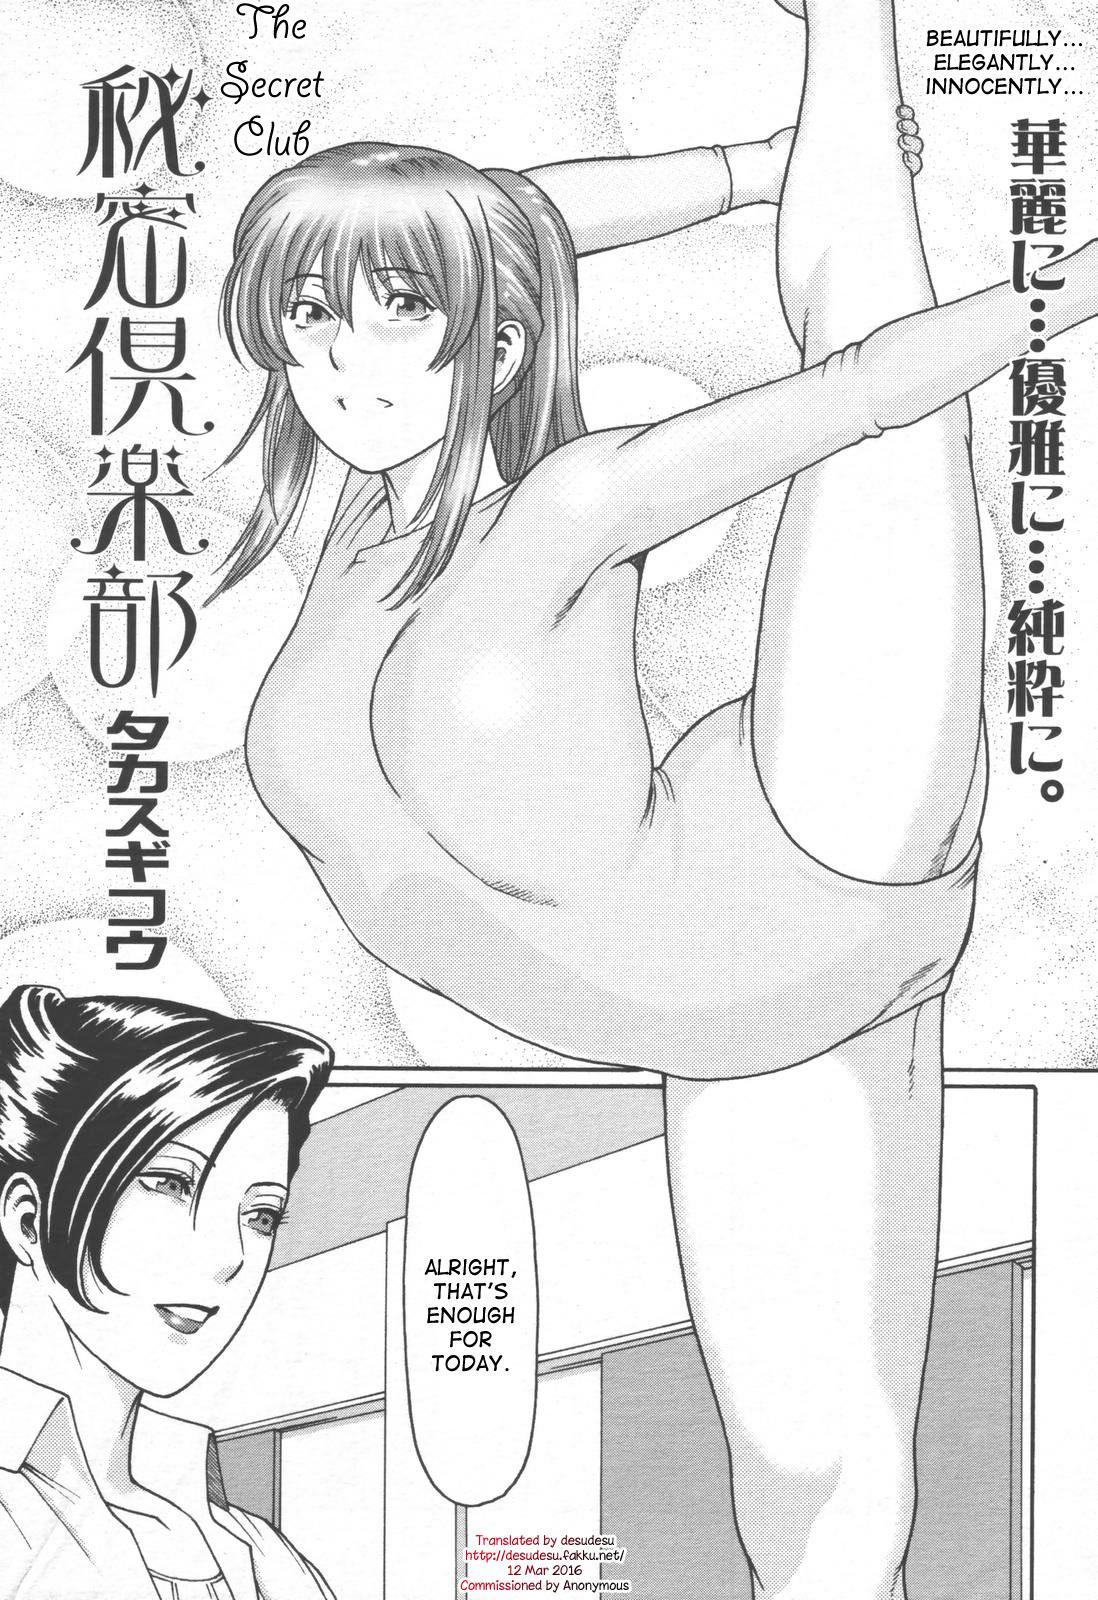 Himitsu Club | The Secret Club 0